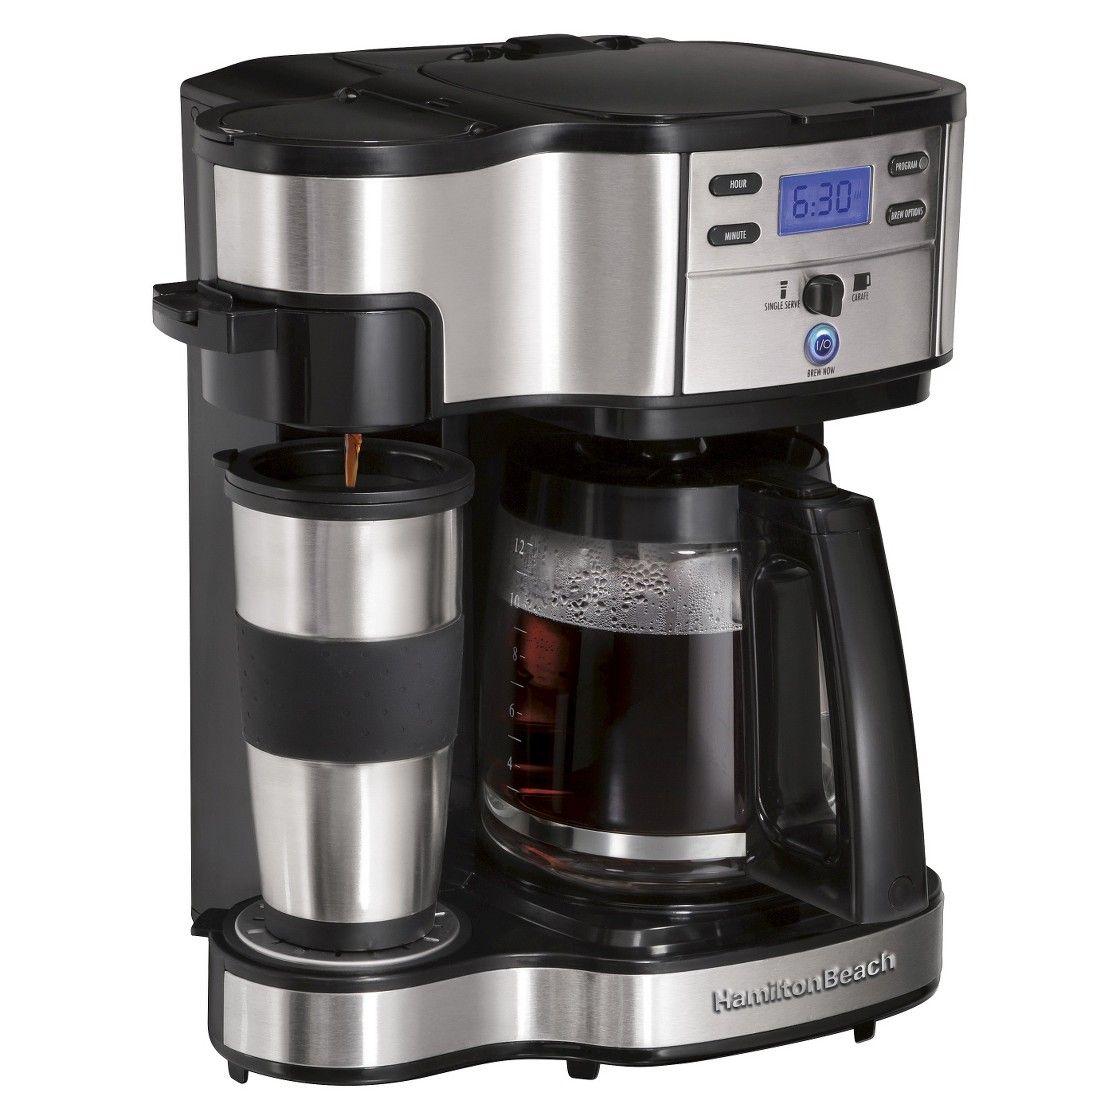 Hamilton Beach Black 2Way Brewer Coffee maker reviews